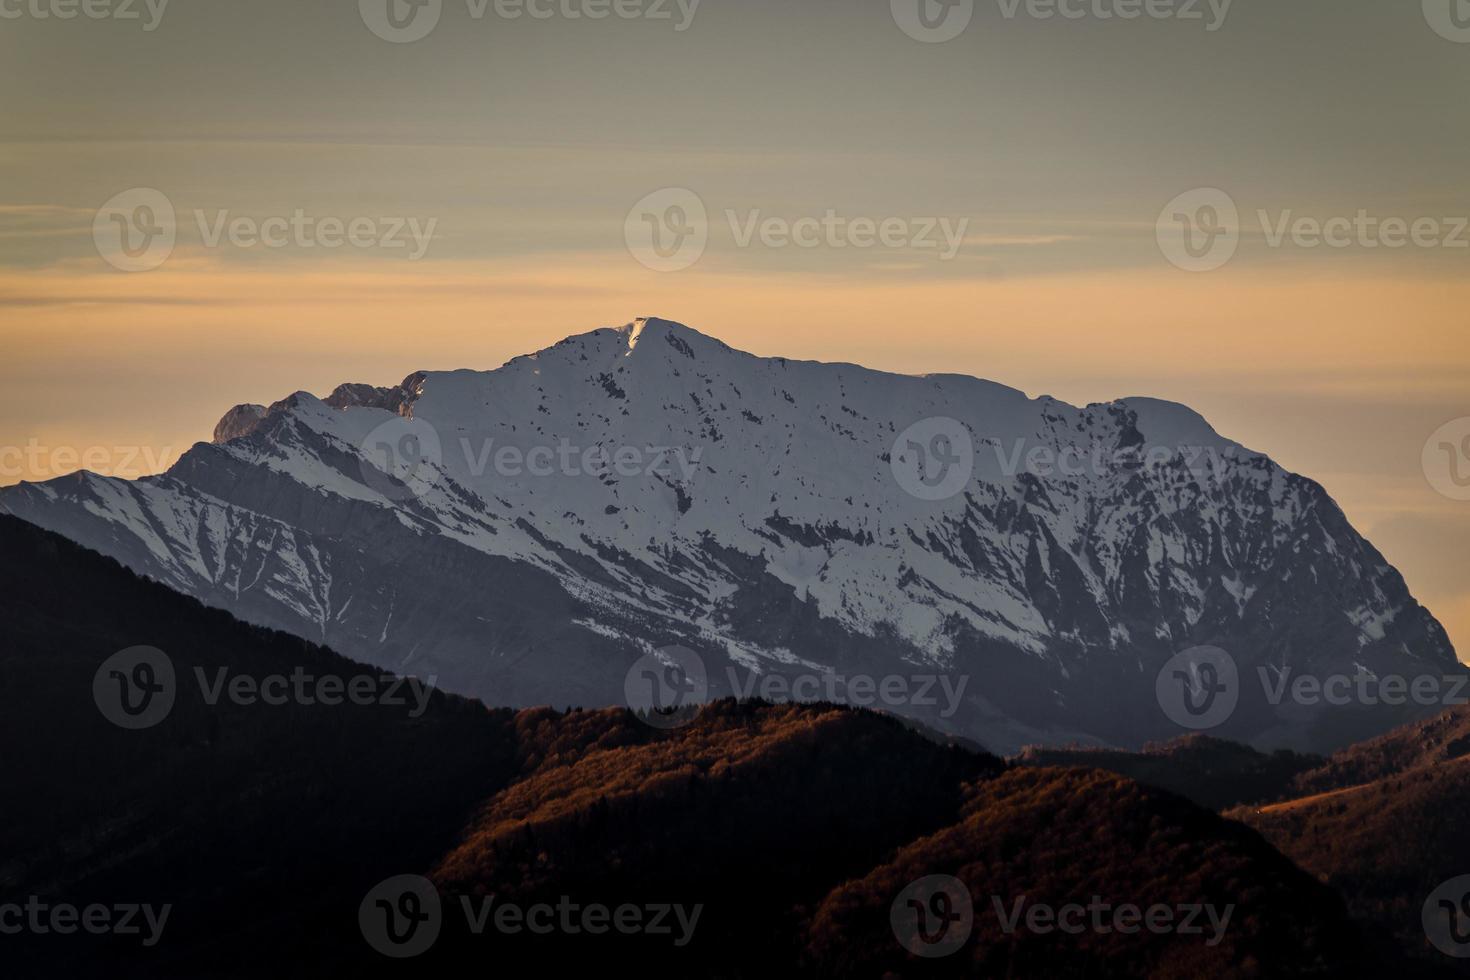 Mount Grigna über Lecco Italien. Ostseite foto